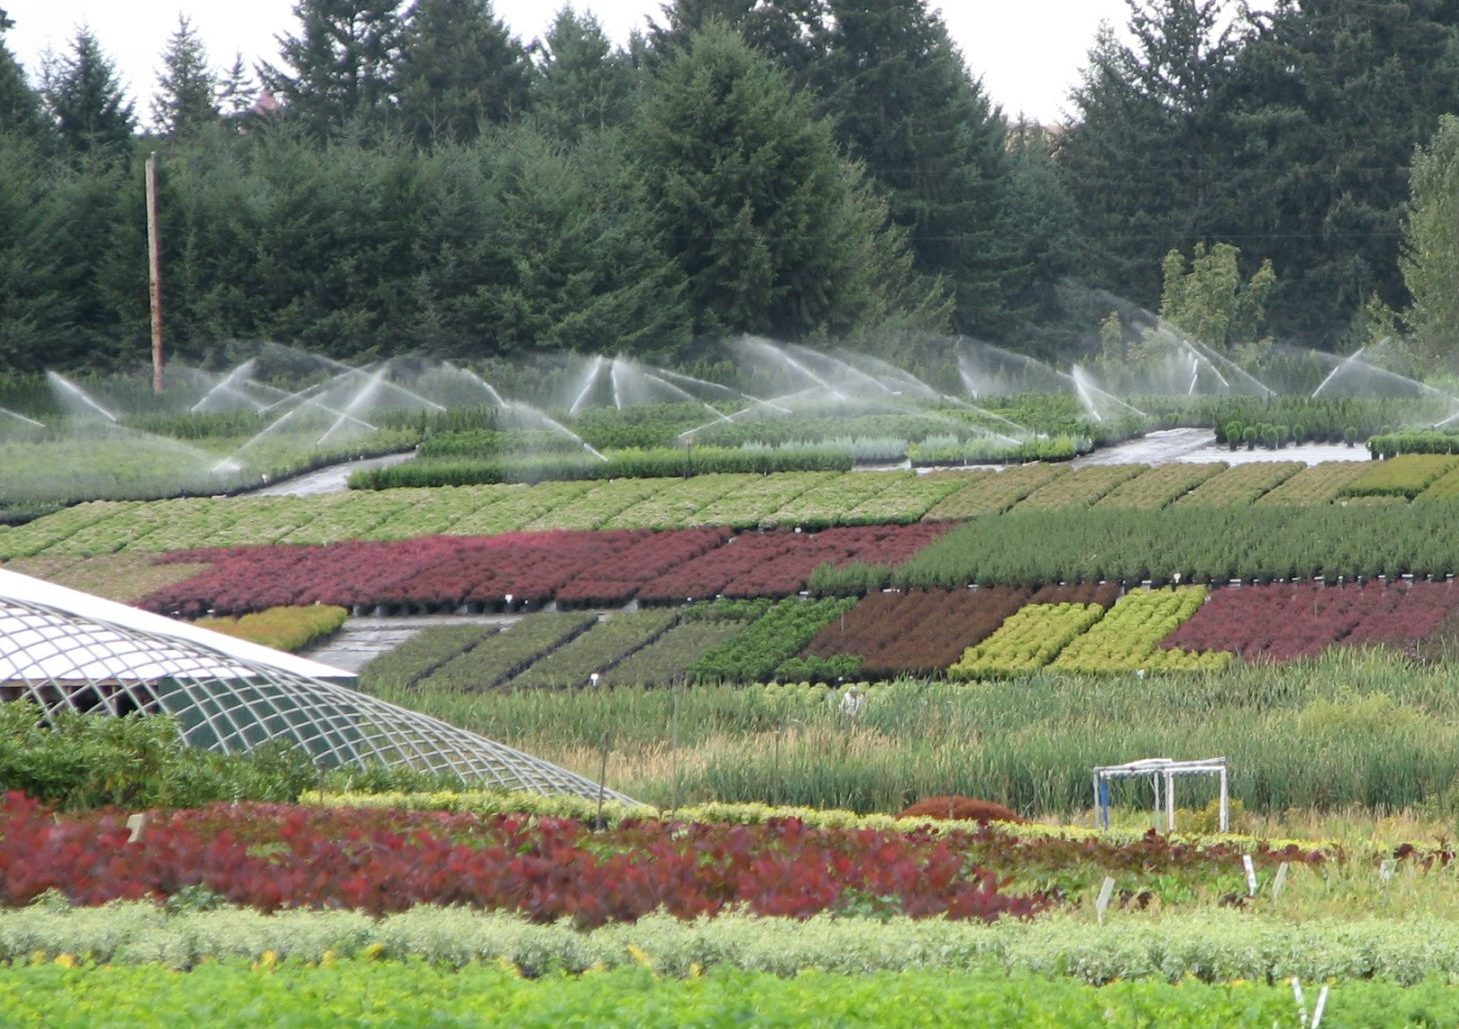 Overhead Irrigation Container Nursery